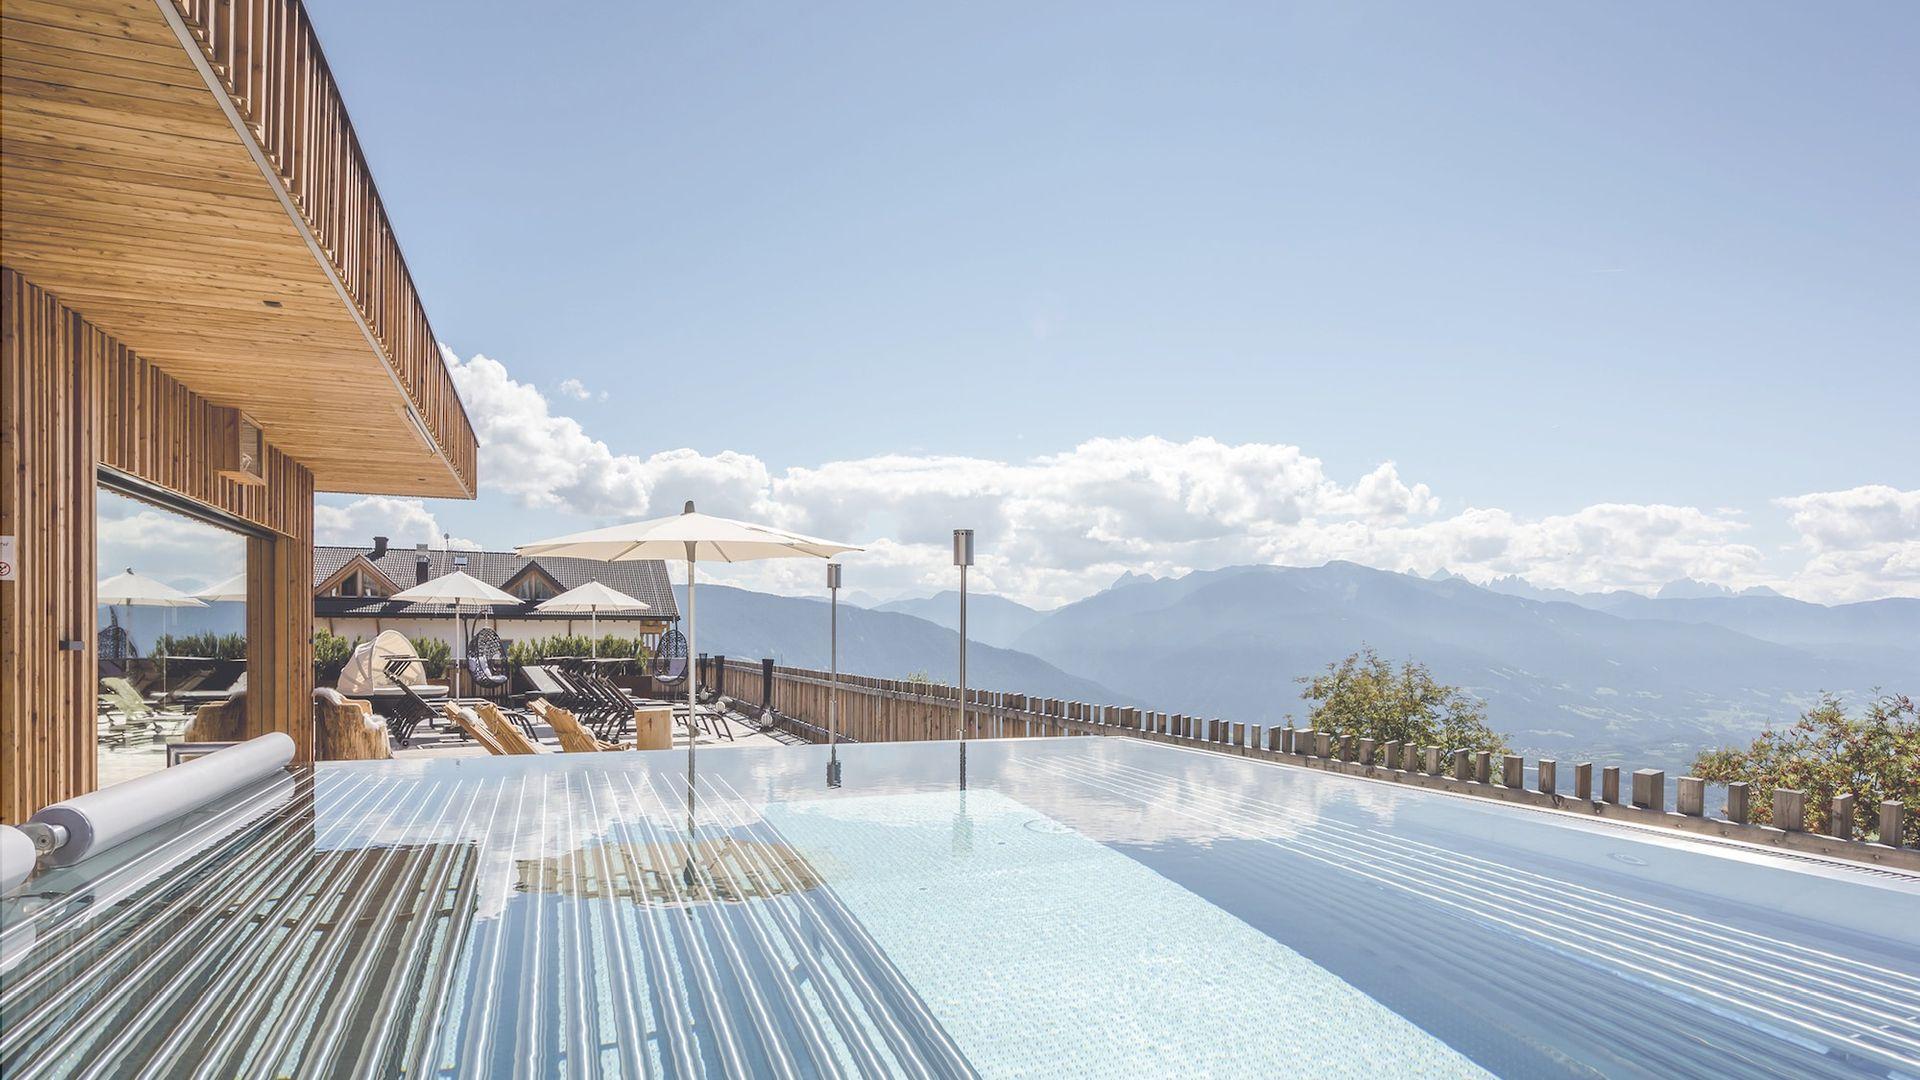 4*S Tratterhof - The Mountain Sky Hotel